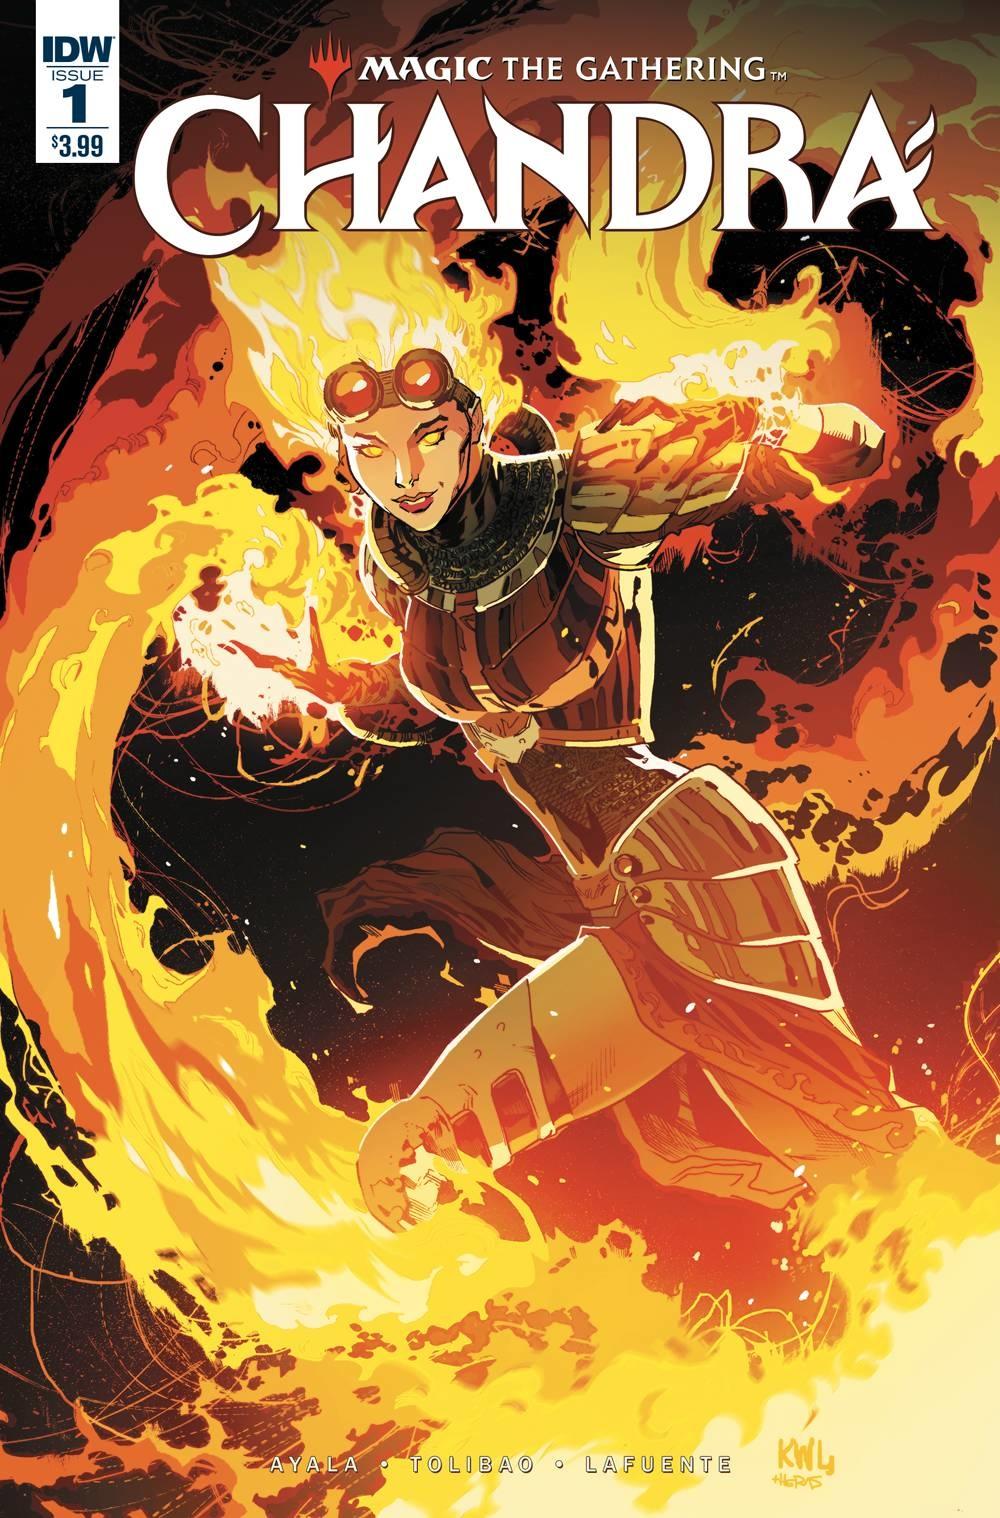 IDW Magic the Gathering Chandra #1-#4